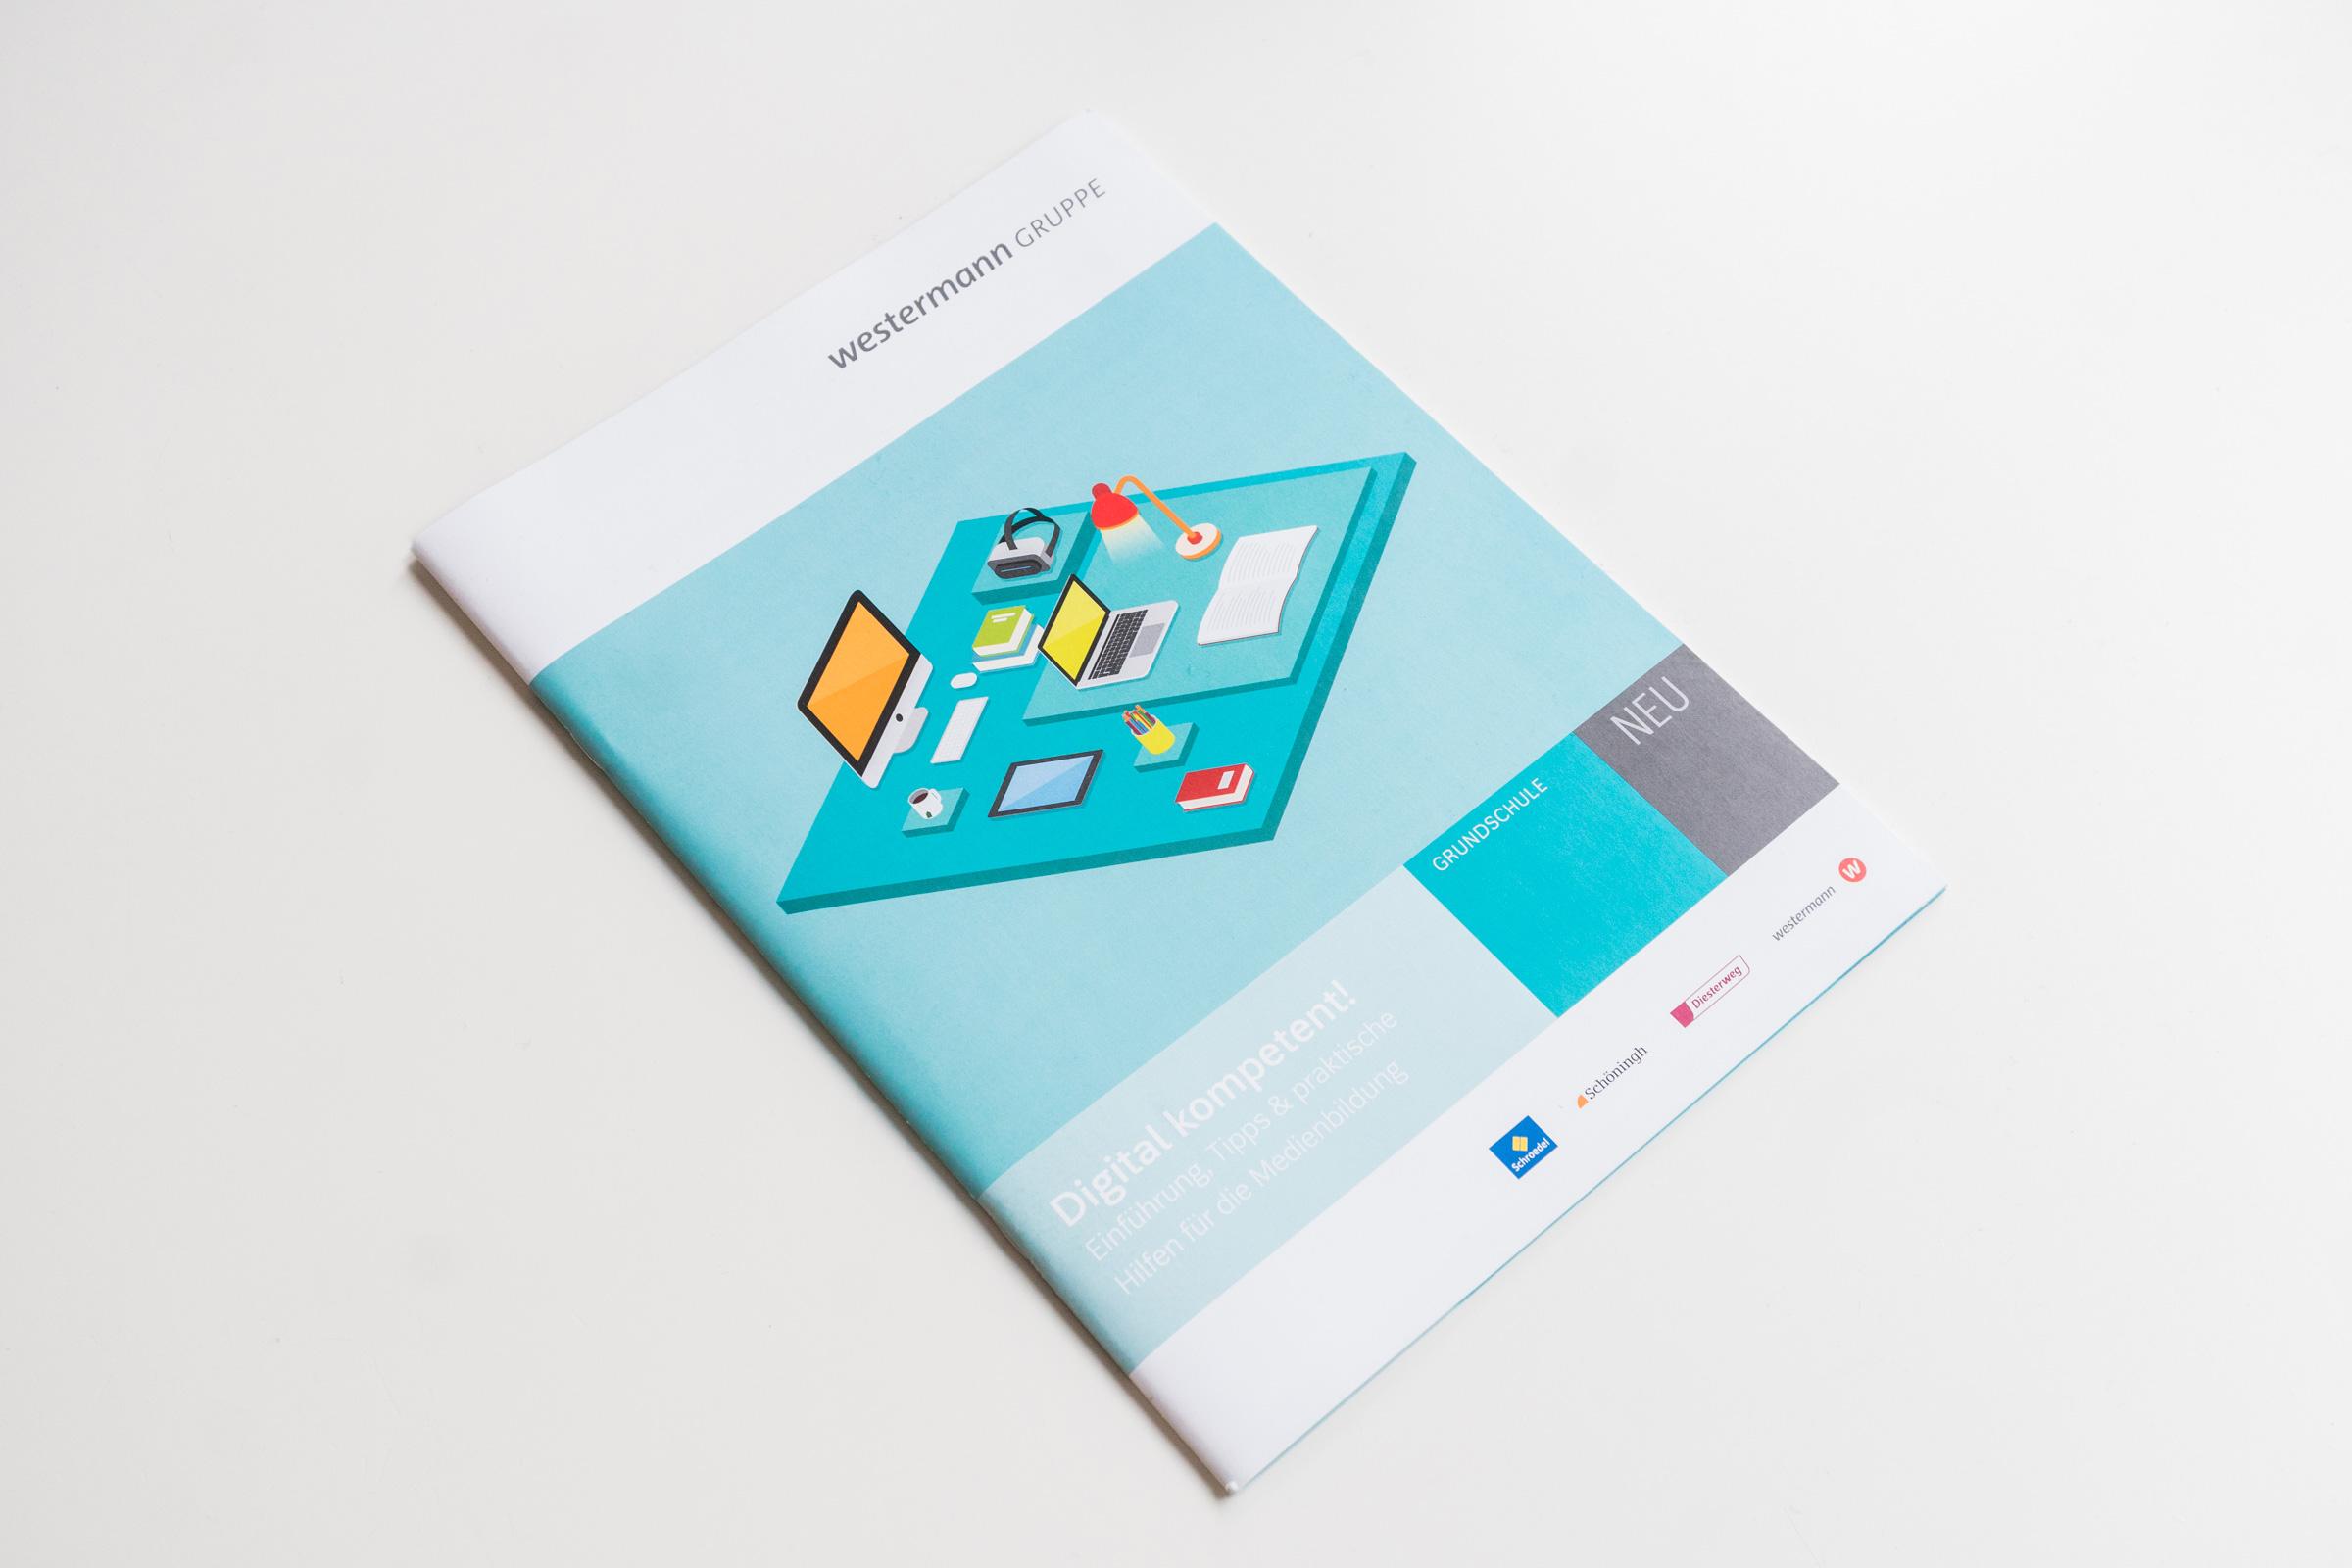 godewind-westermann-corporate-publishing-digitale-bildung